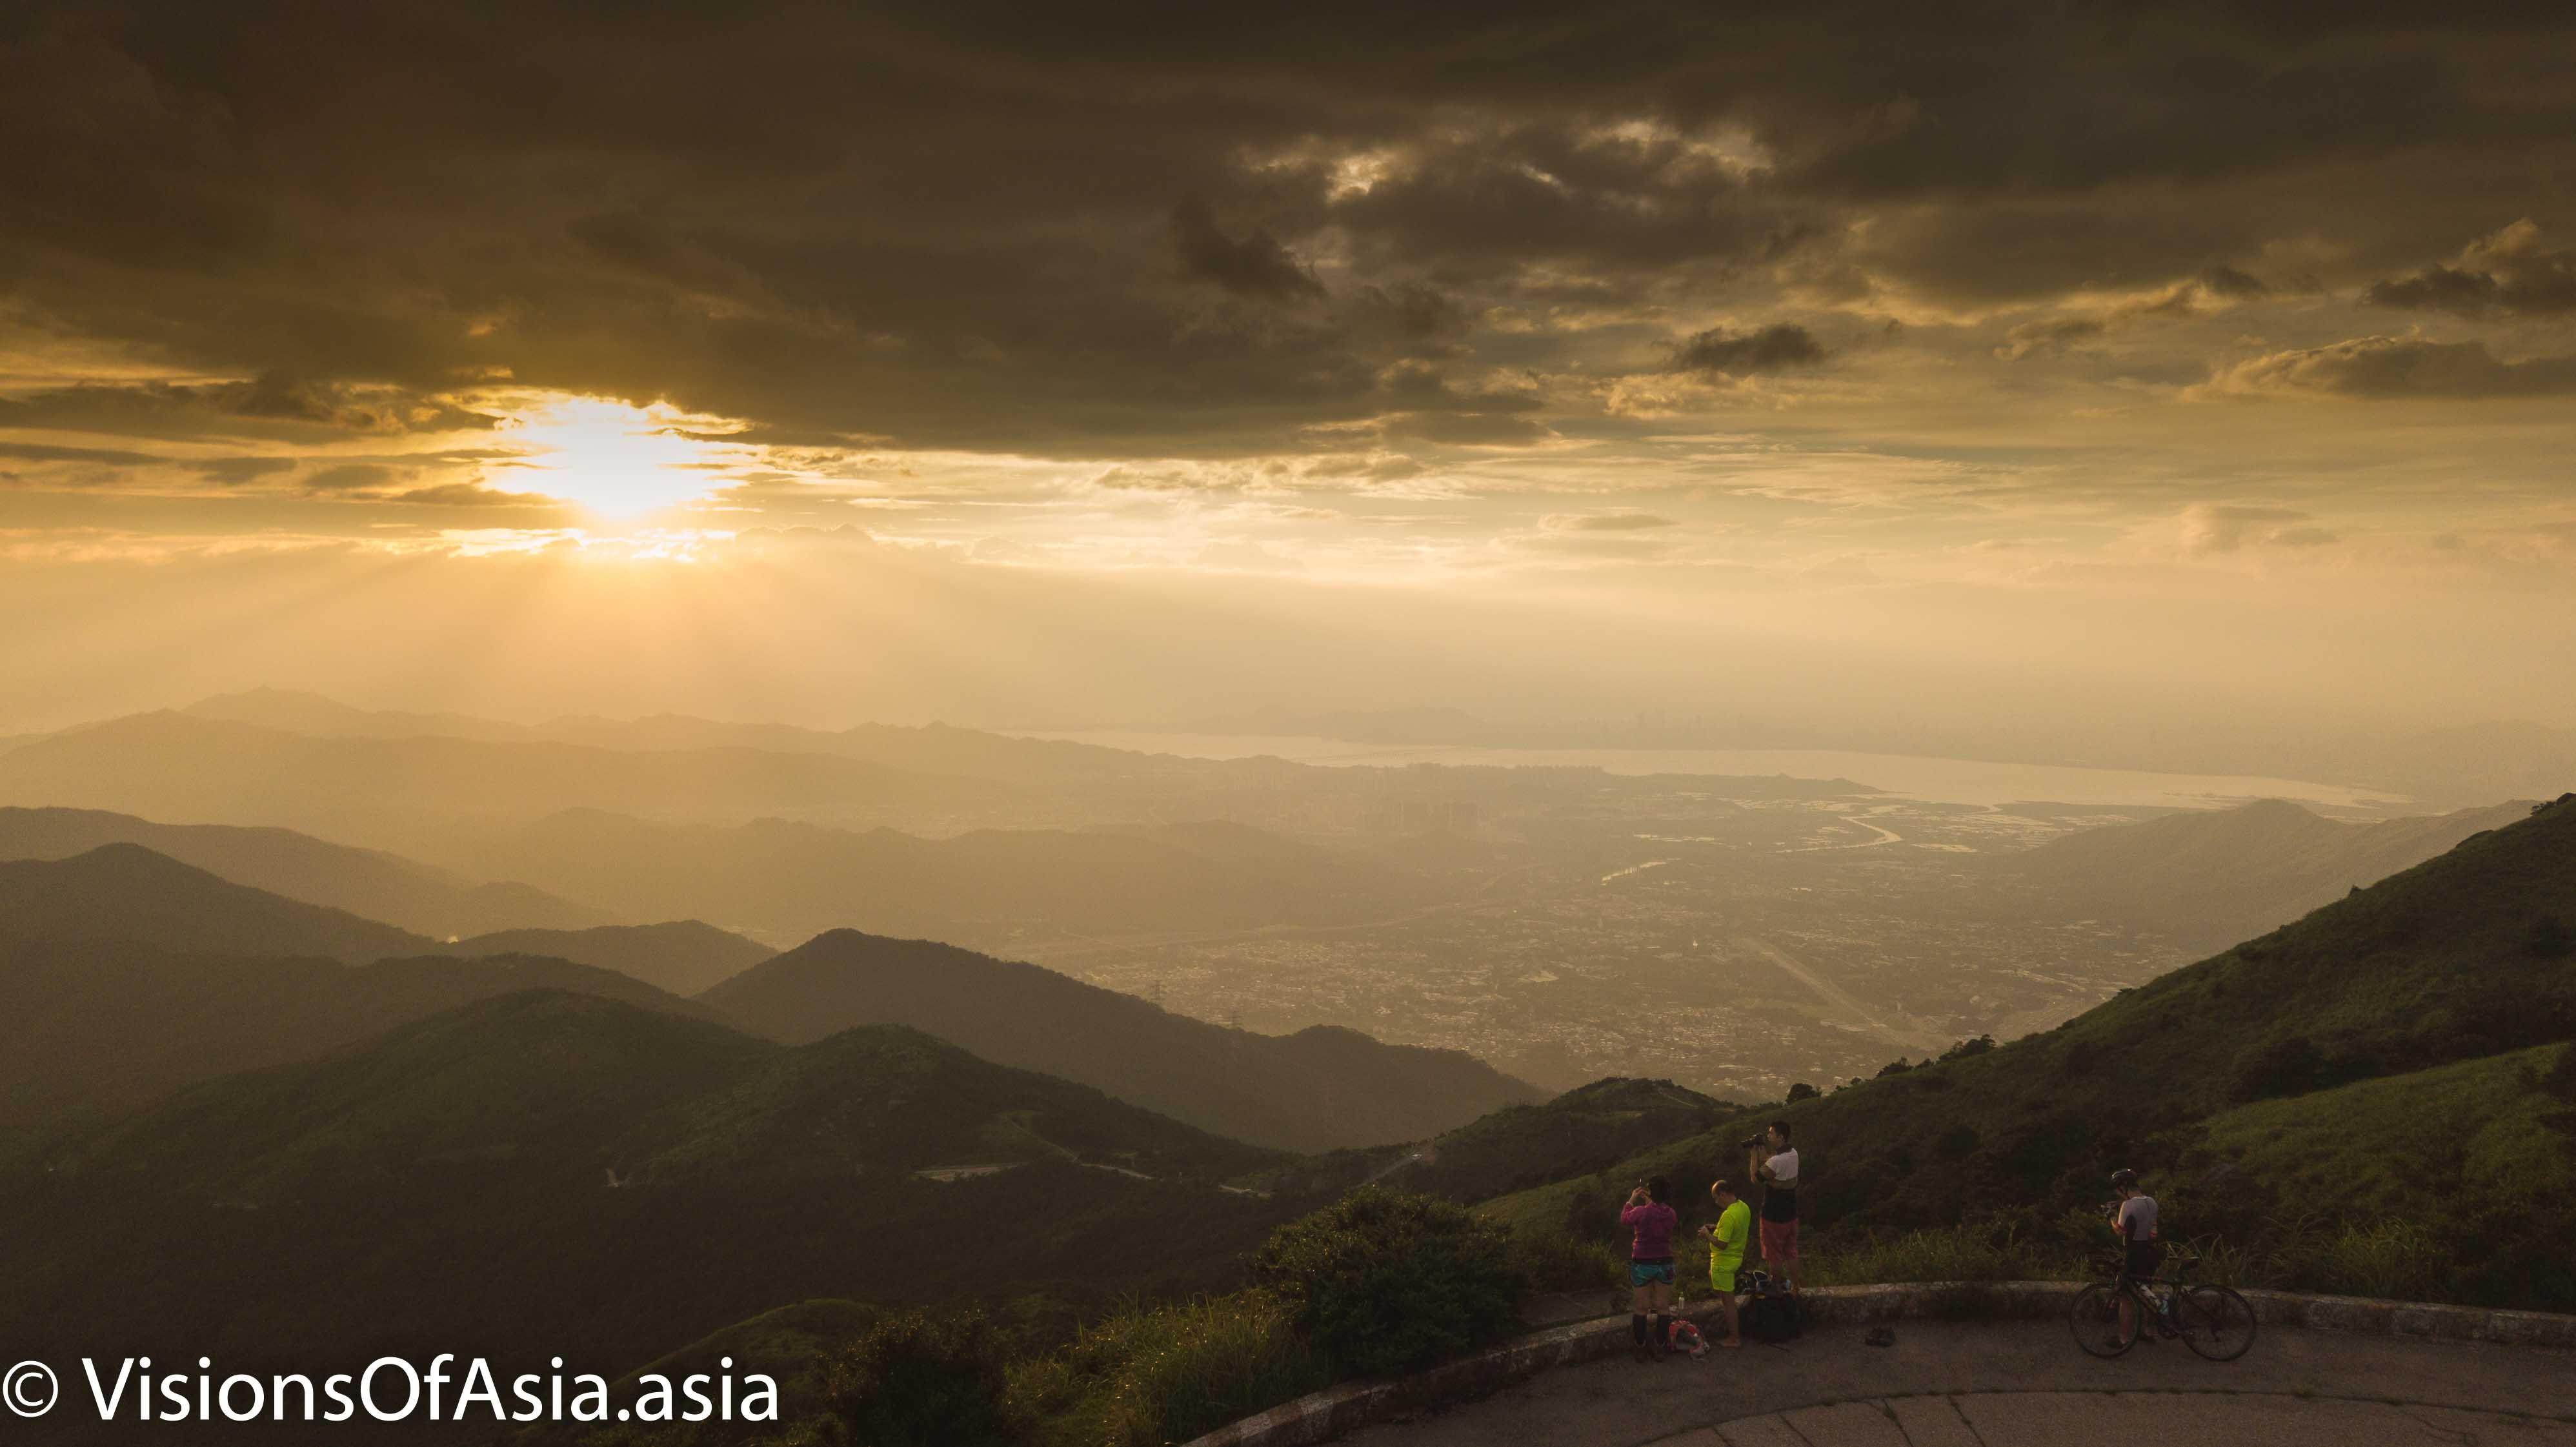 sunset over Tai Mo Shan